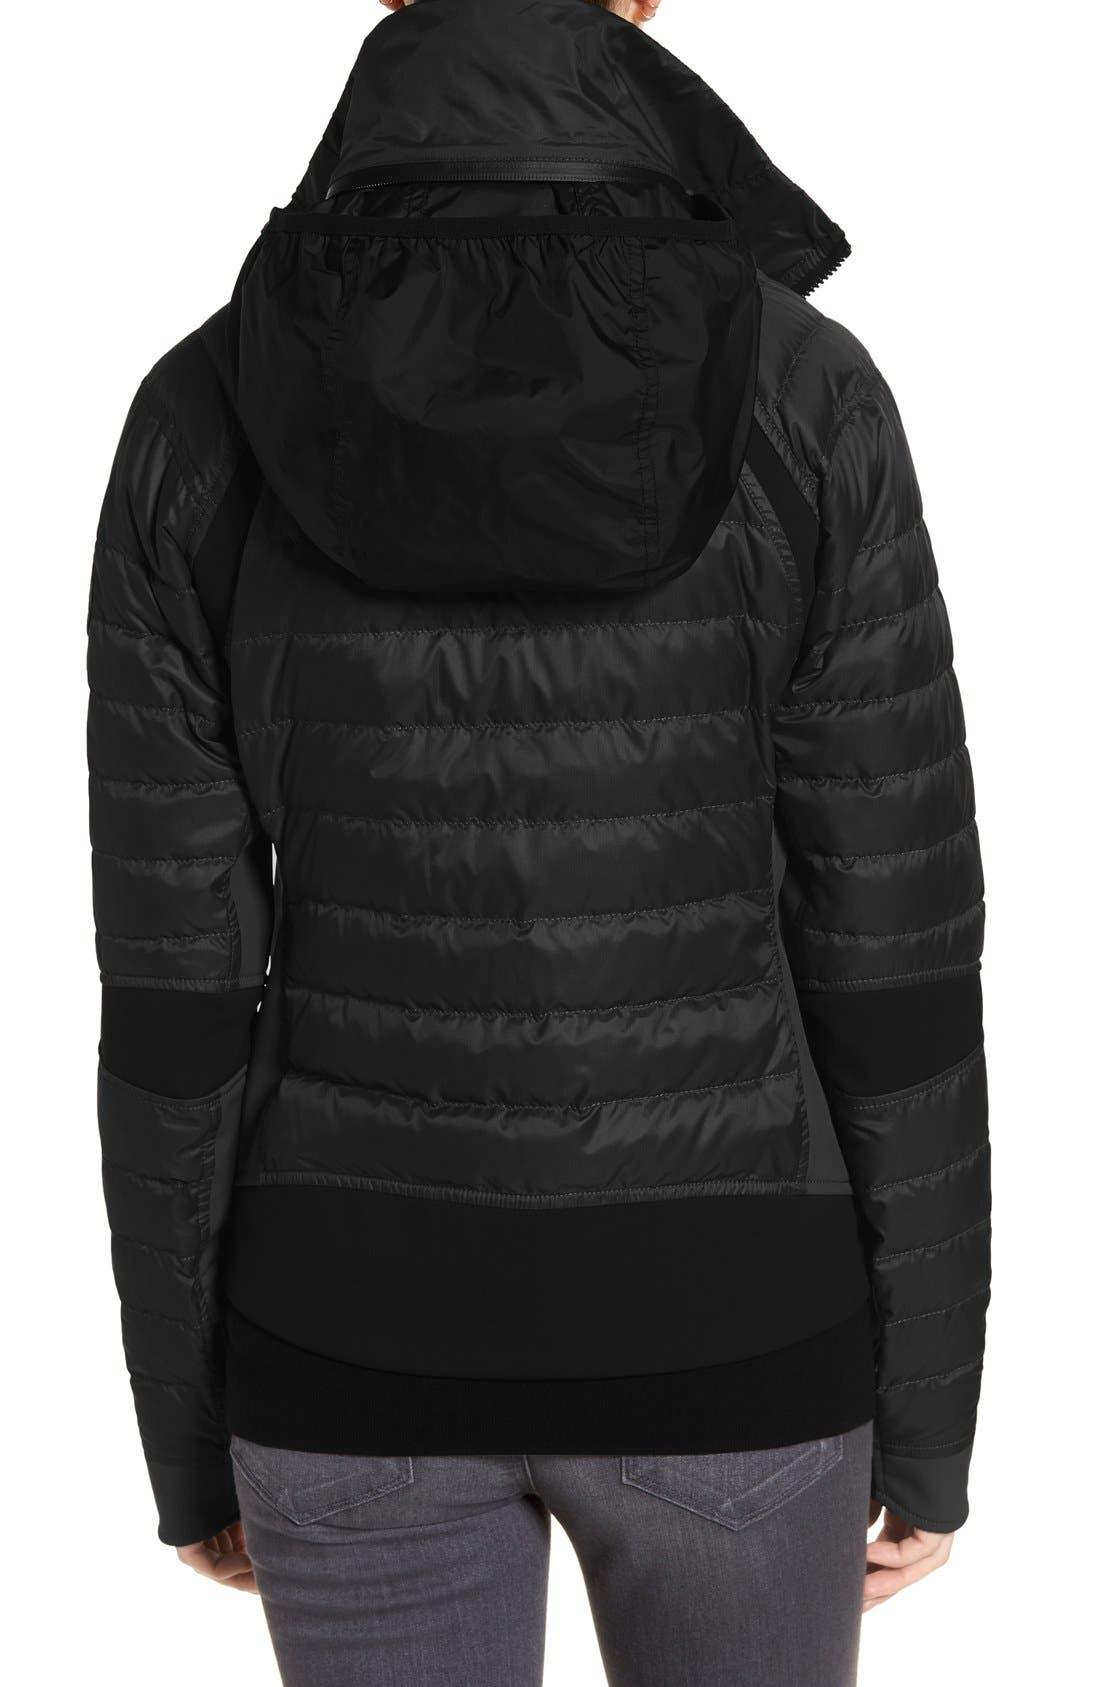 CANADA GOOSE, Hybridge Perren Jacket, Alternate thumbnail 5, color, BLACK